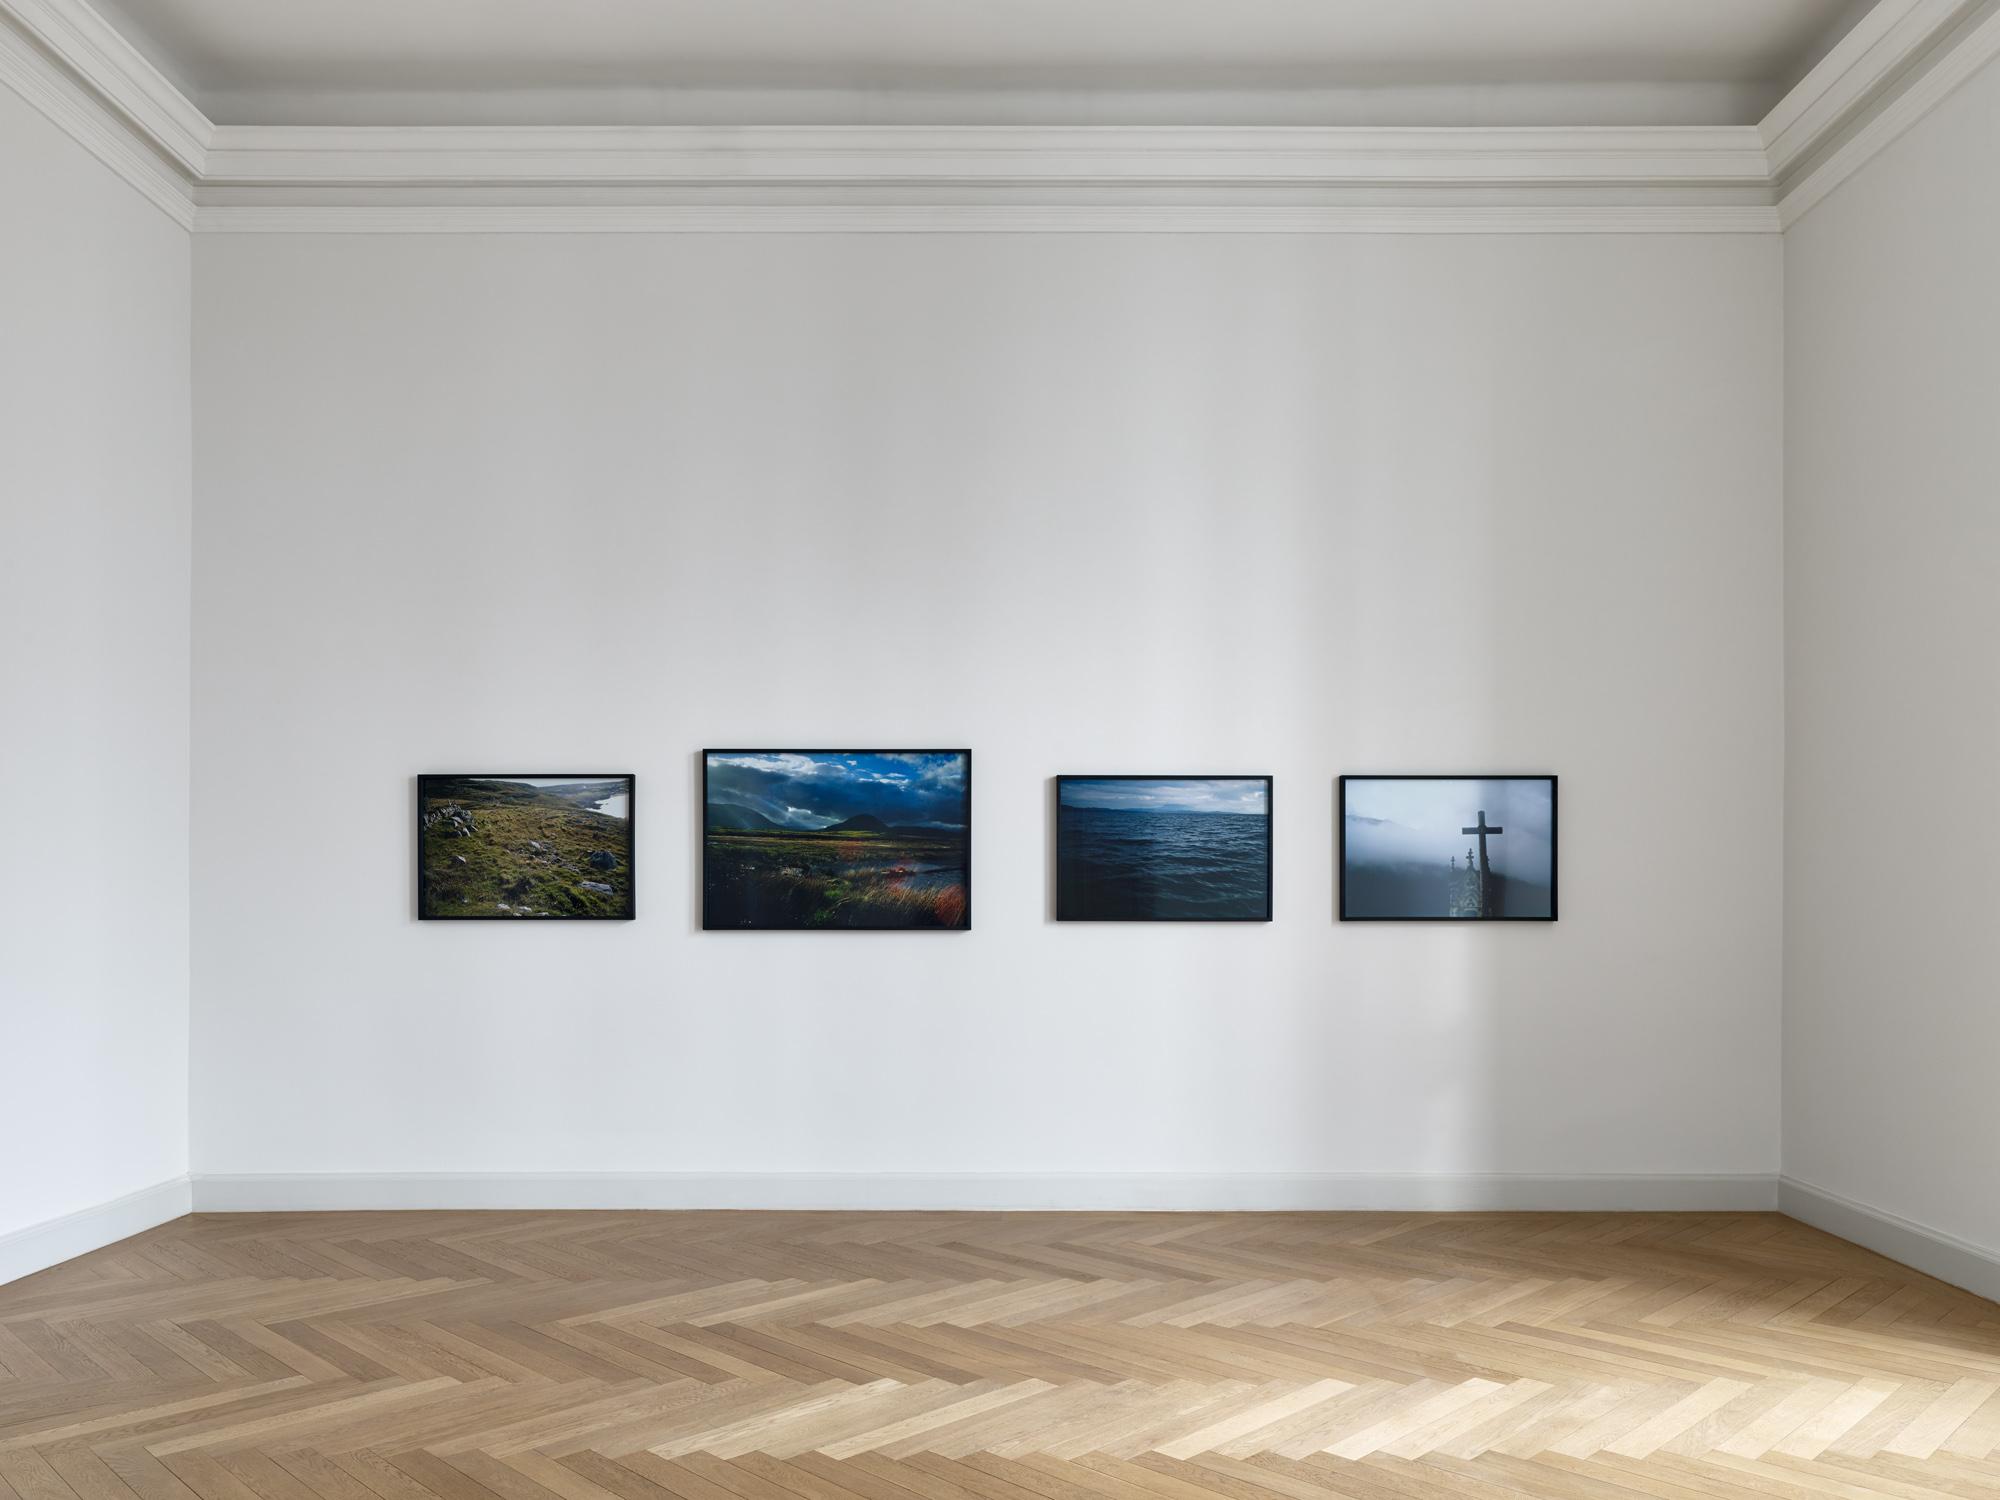 Installation view, Pedro Cabrita Reis, Nan Goldin, Justin Matherly at Galerie Kewenig